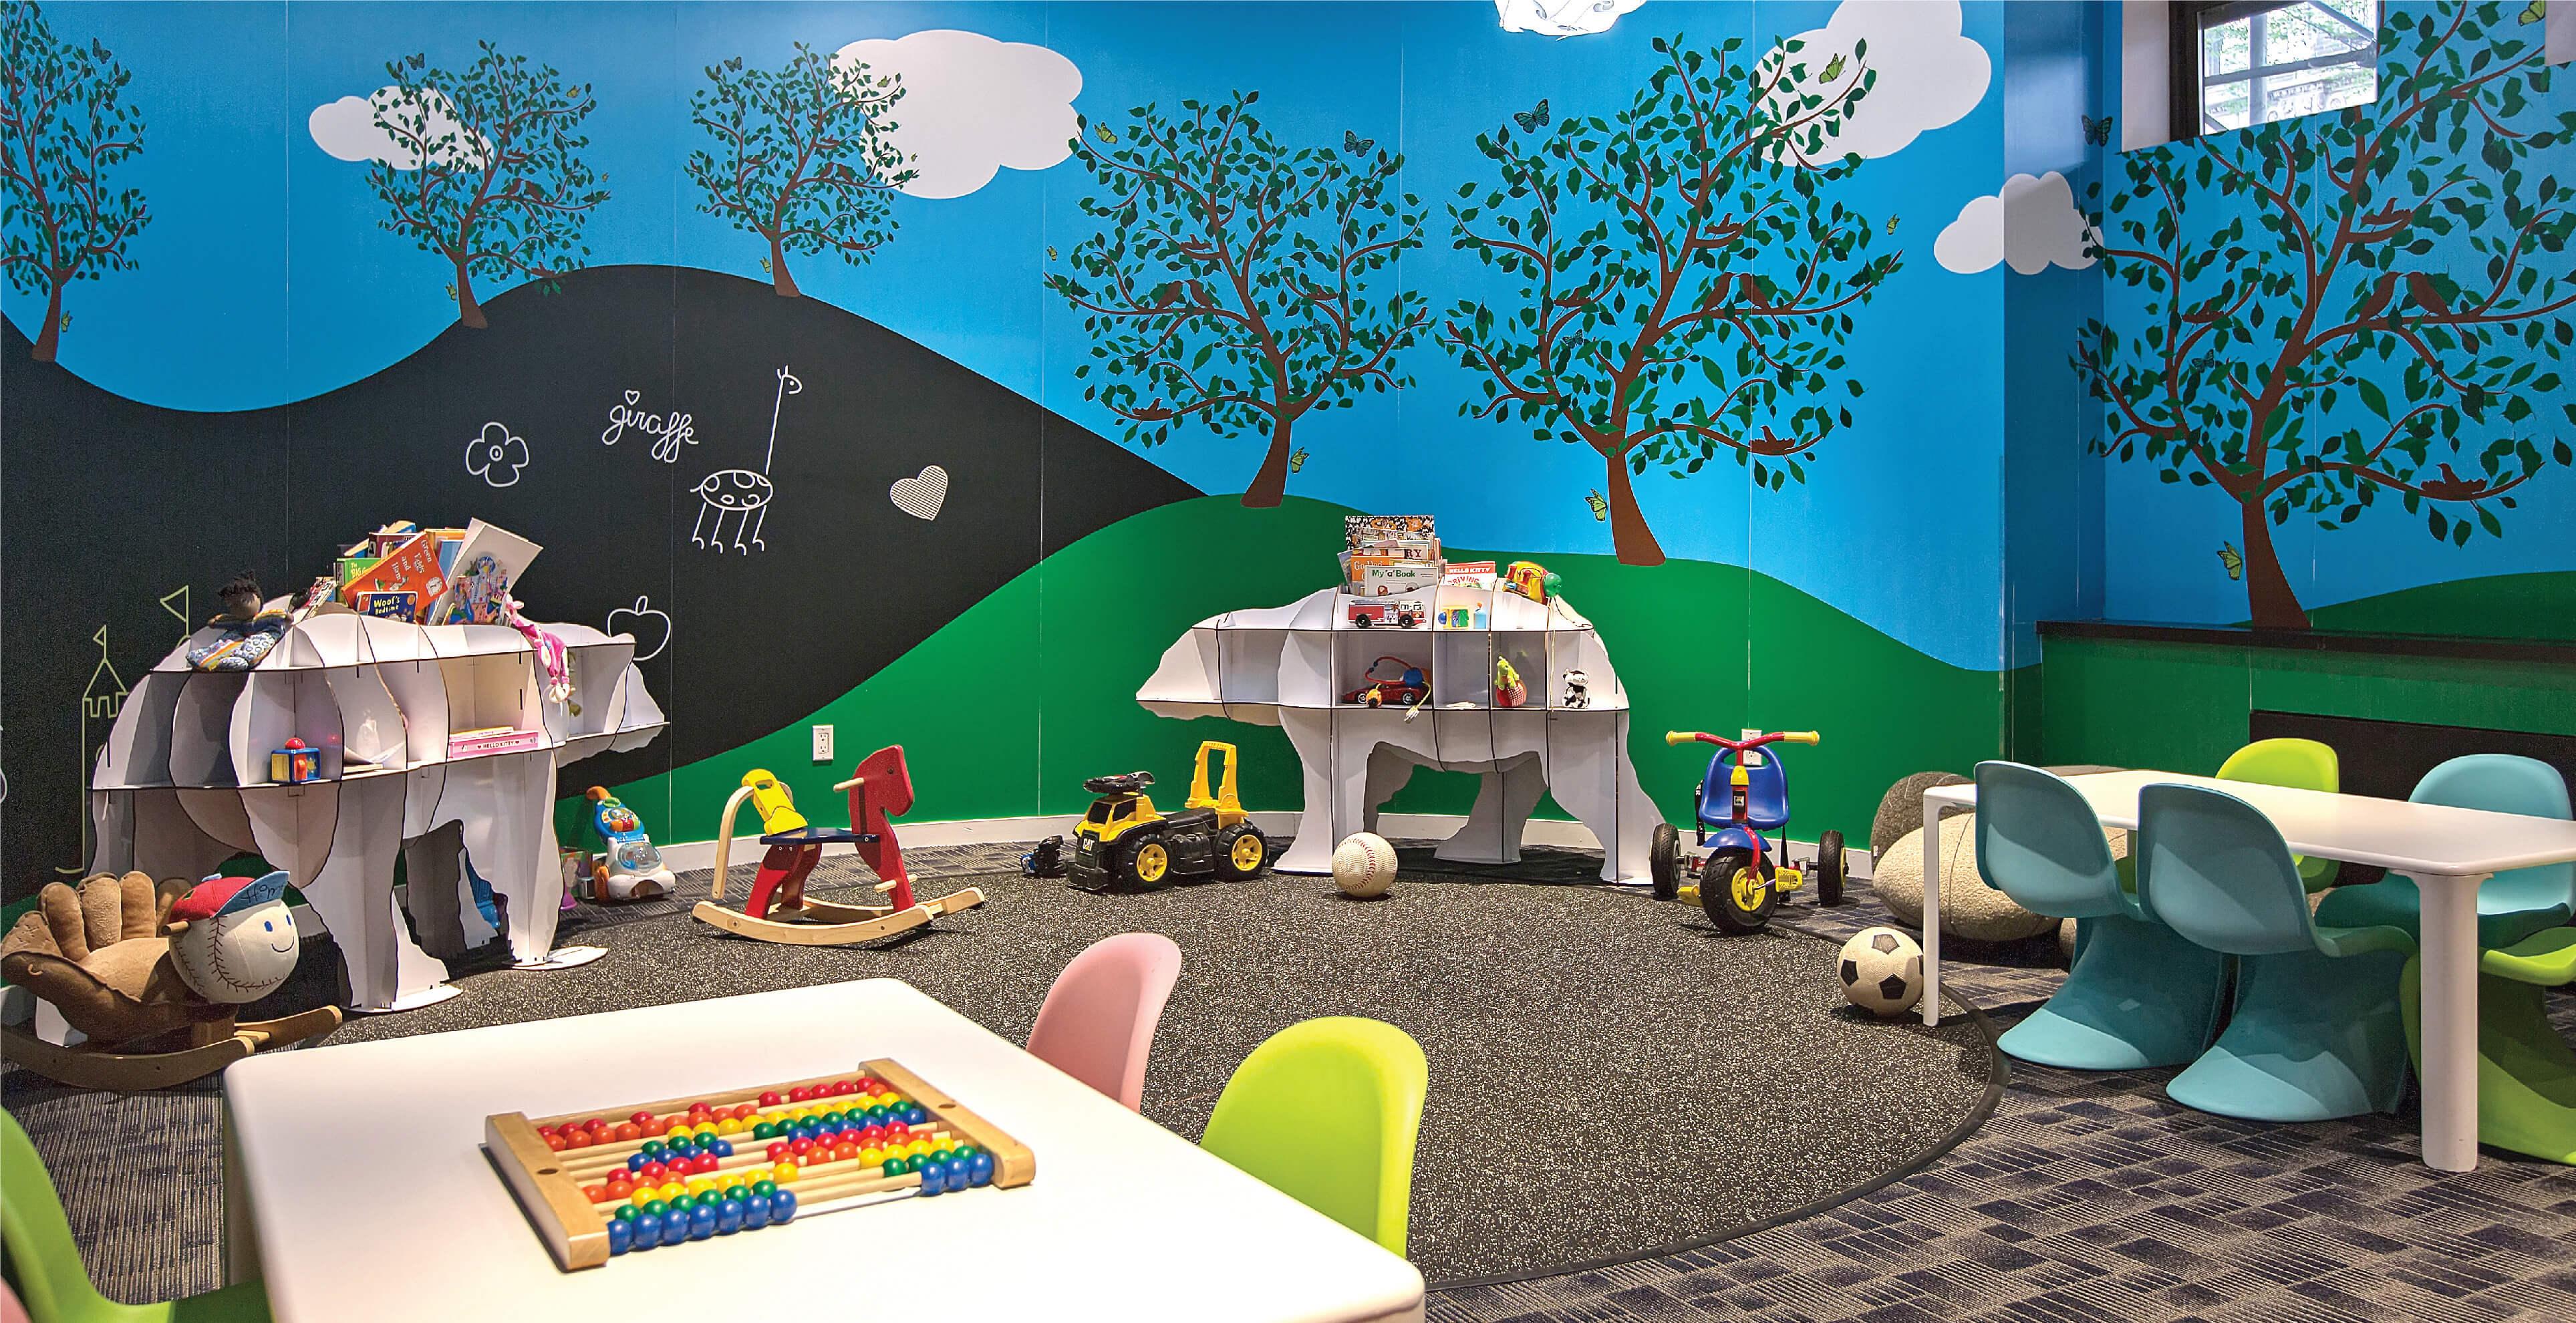 windermere building playrm image